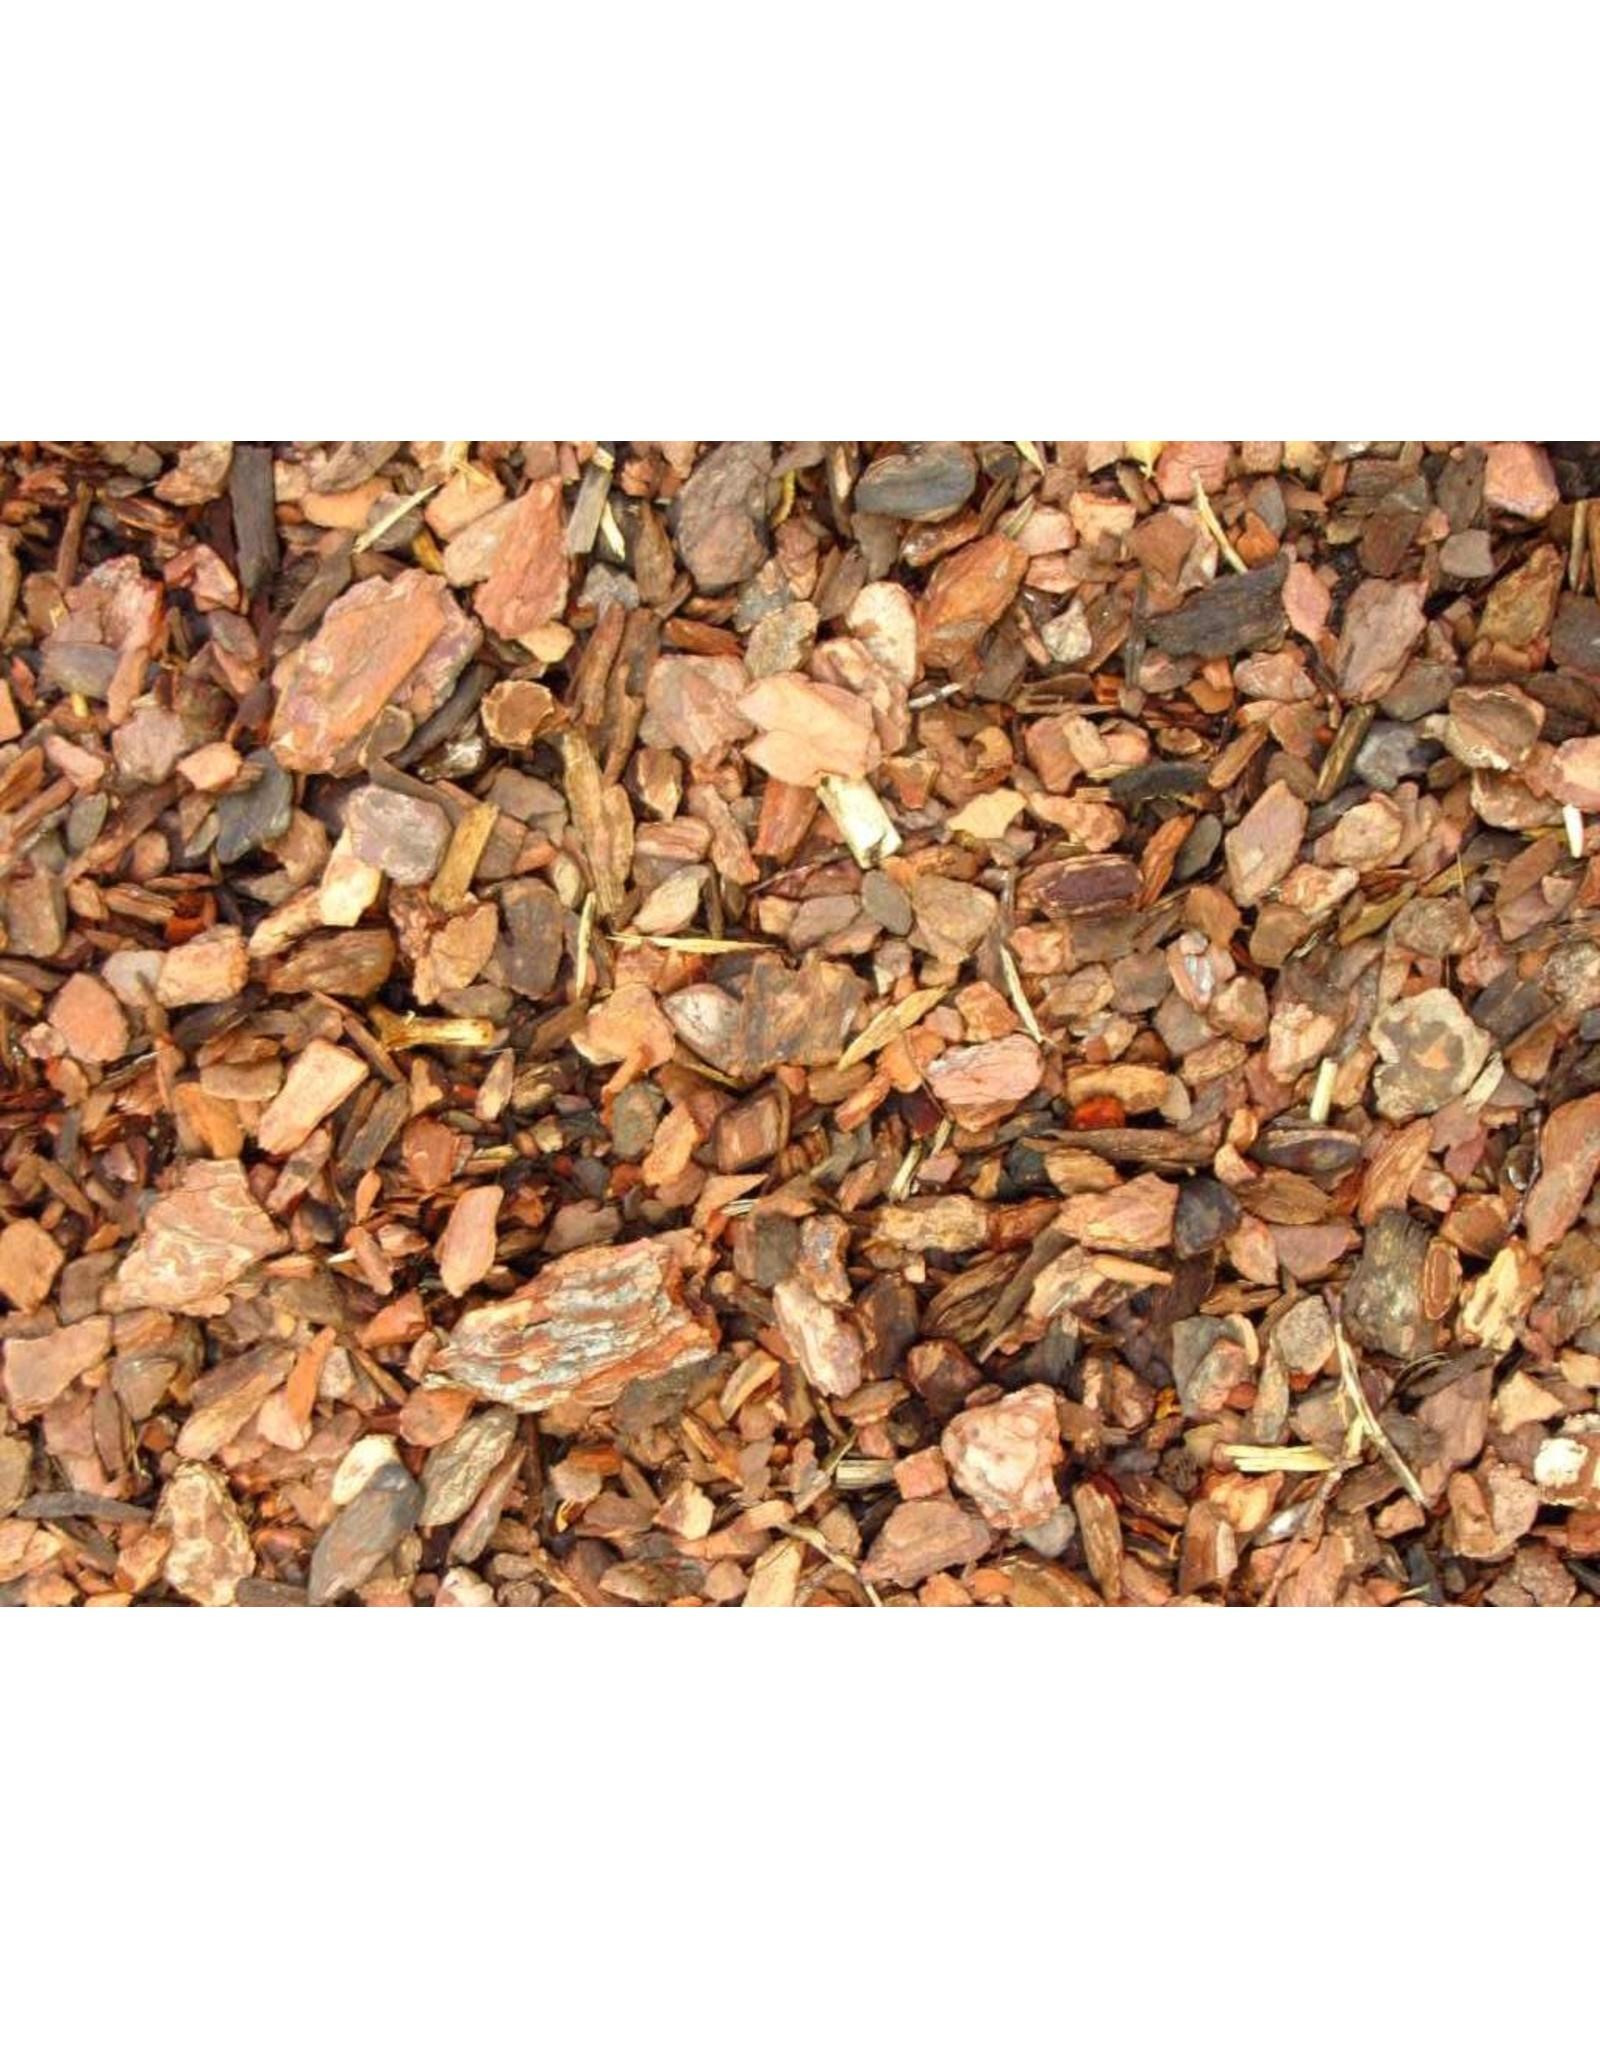 Bulk Pine Bark Mulch (cubic yard)